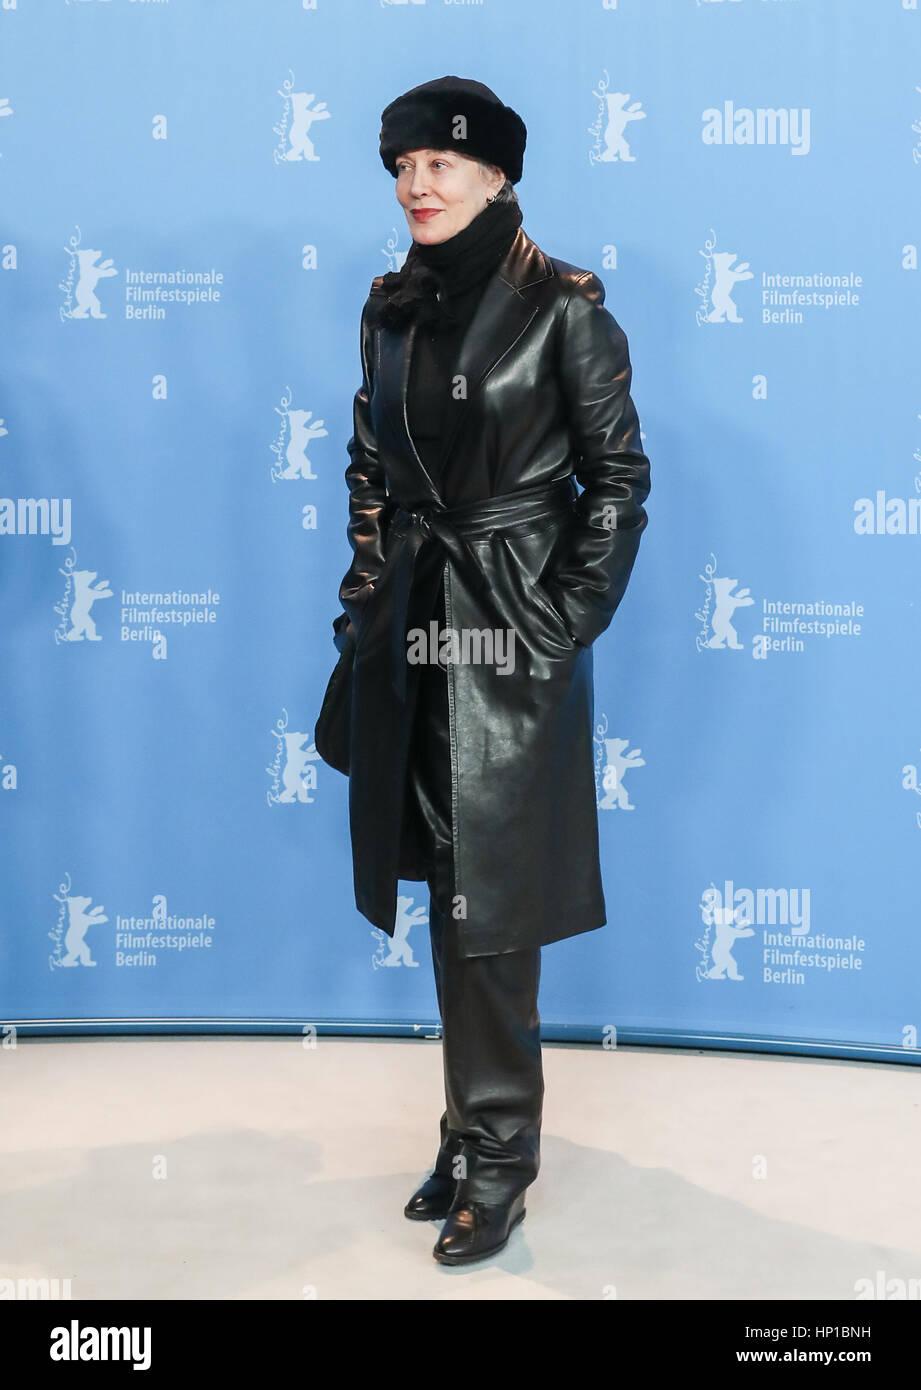 Berlin, Germany. 16th Feb, 2017. Italian film costume designer Milena Canonero attends a photocall during the 67th - Stock Image